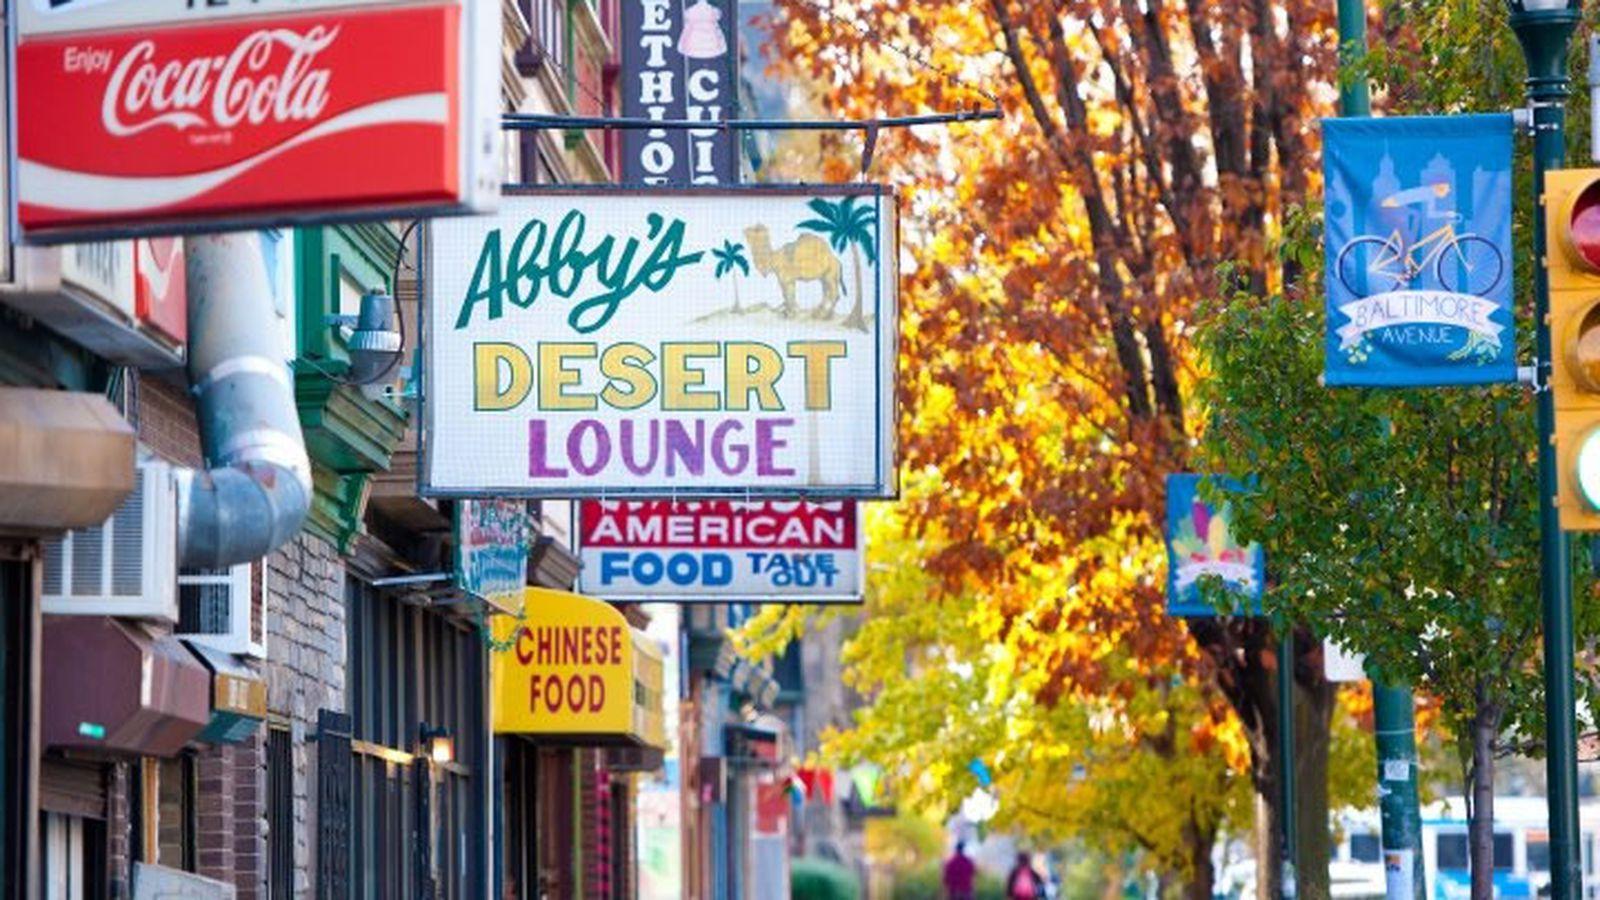 Ethiopian Restaurant In West Philadelphia